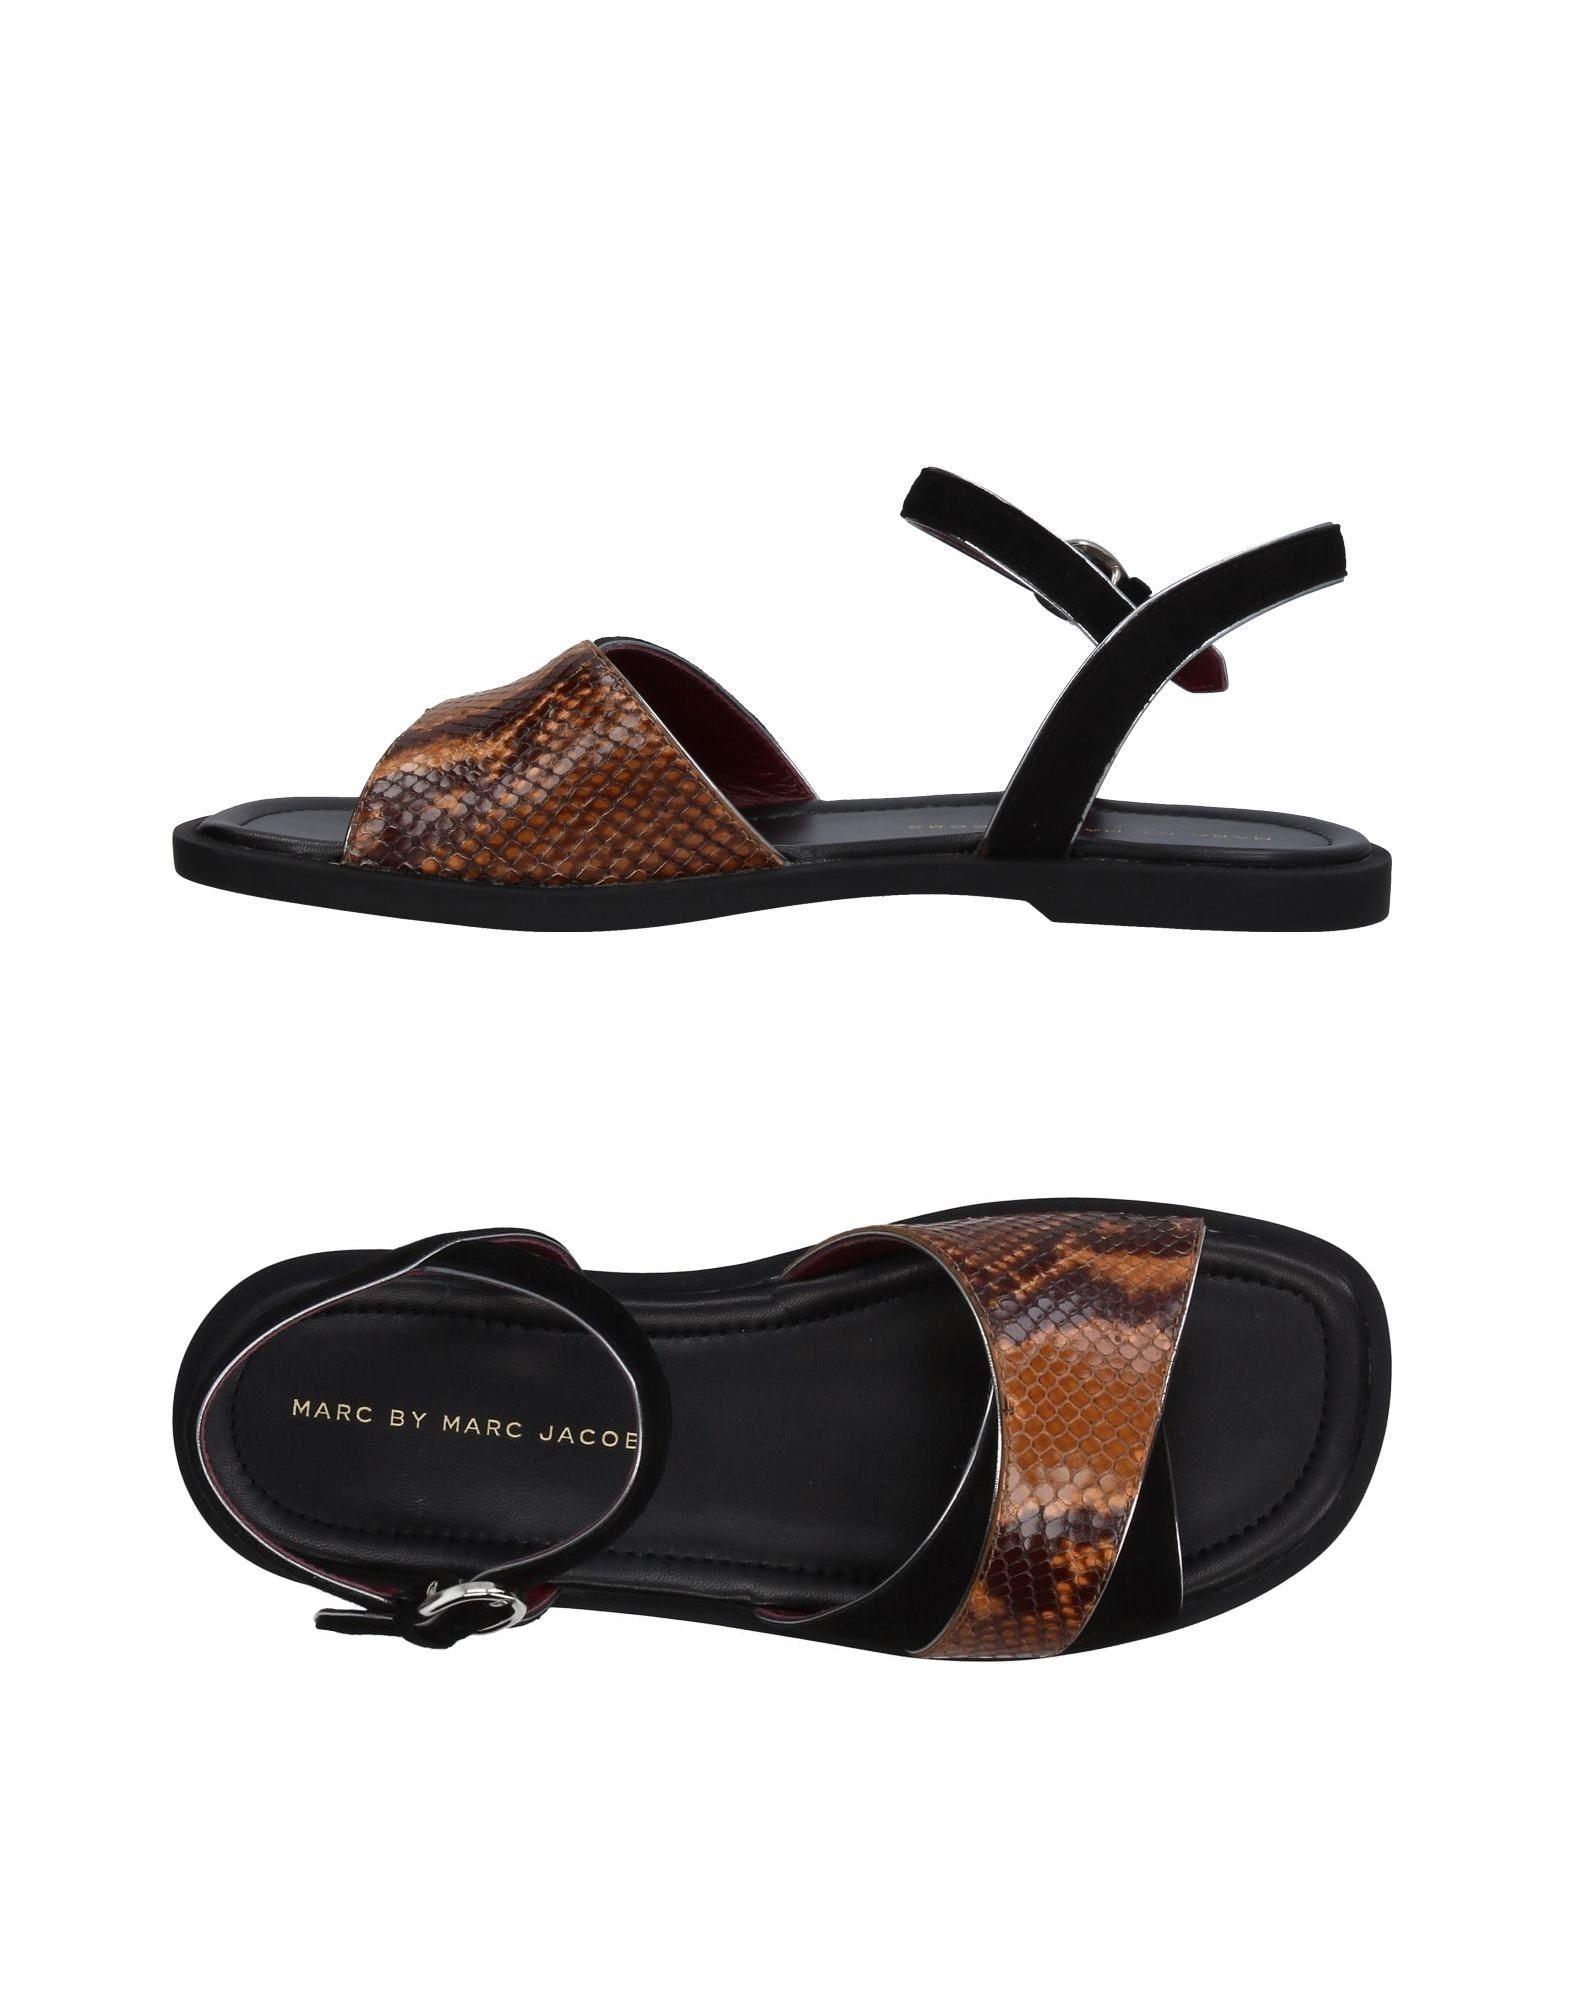 Marc By Marc Jacobs Sandalen Damen  11362117EEGut aussehende strapazierfähige Schuhe